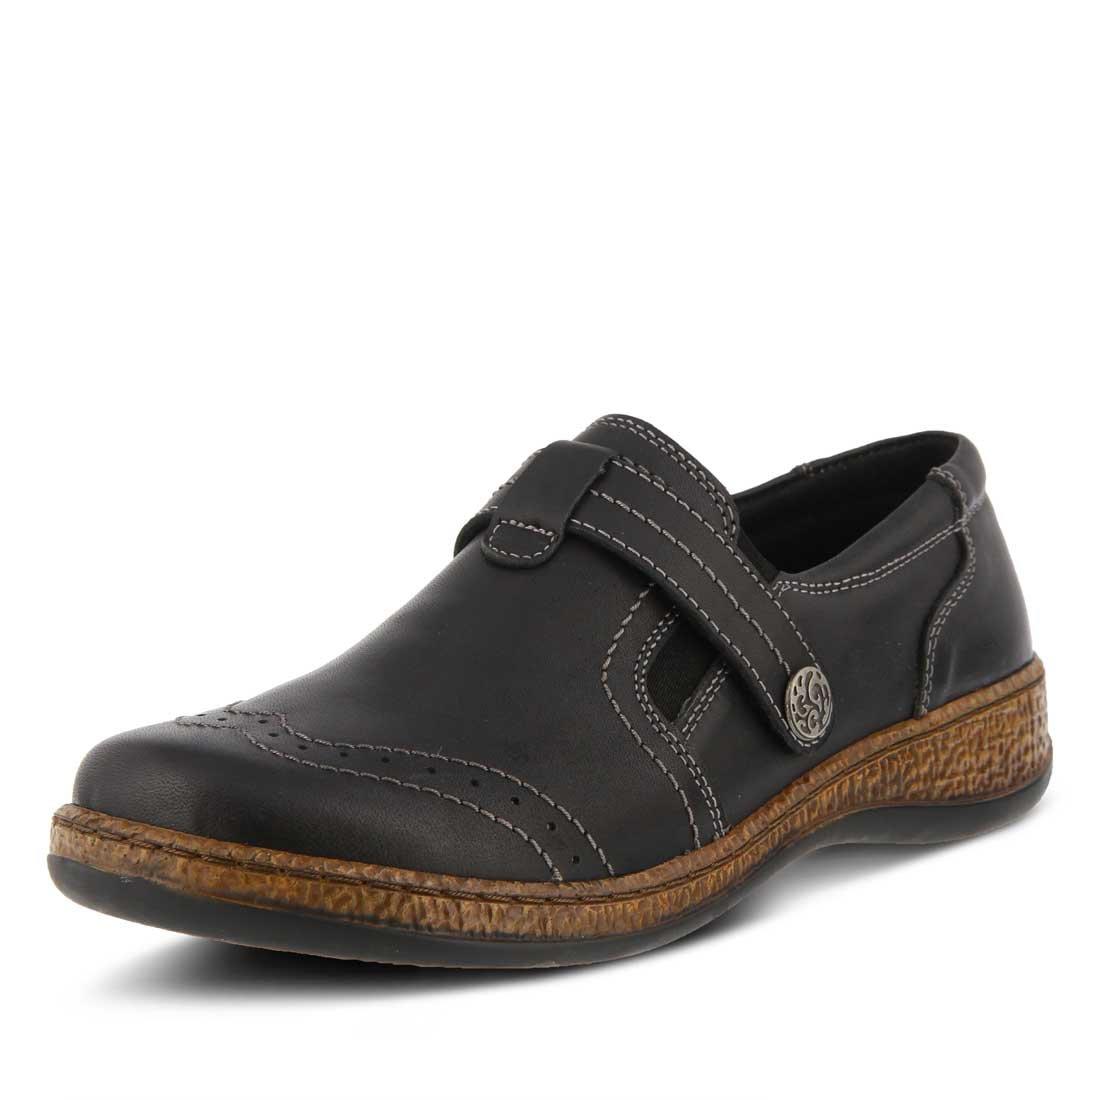 Spring Step Women's Smolqua Strap Slip On Shoe B074JHPQJ6 39|Black